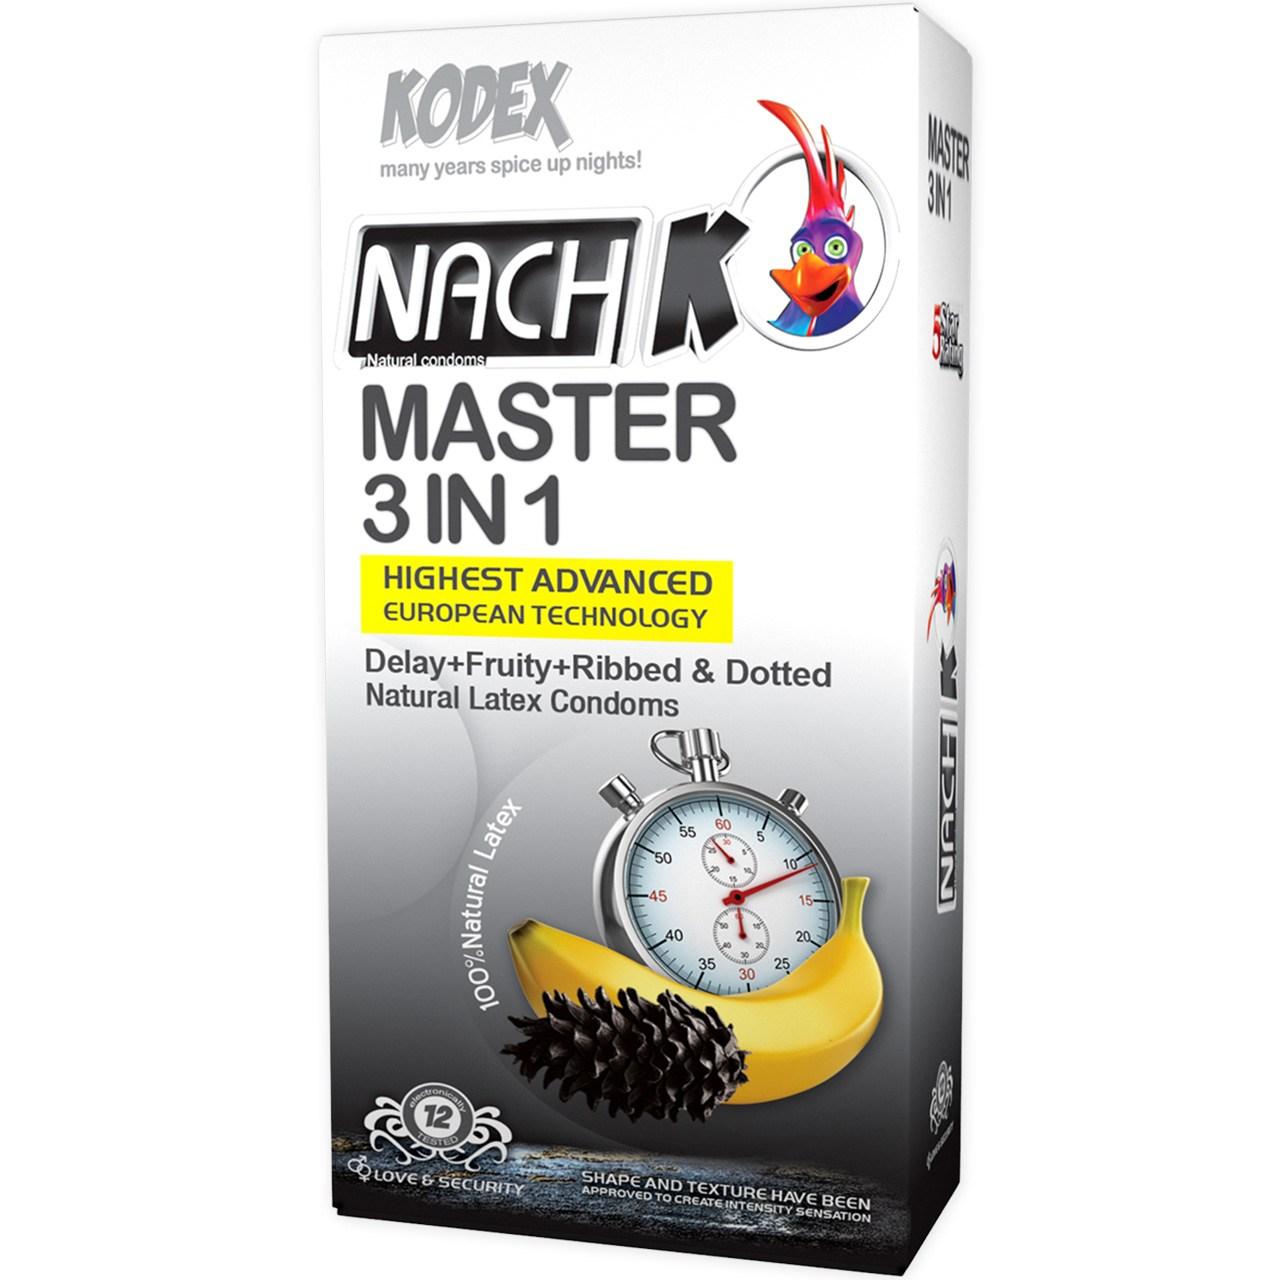 قیمت کاندوم تاخیری کدکس مدل Master 3 In 1 بسته 12 عددی